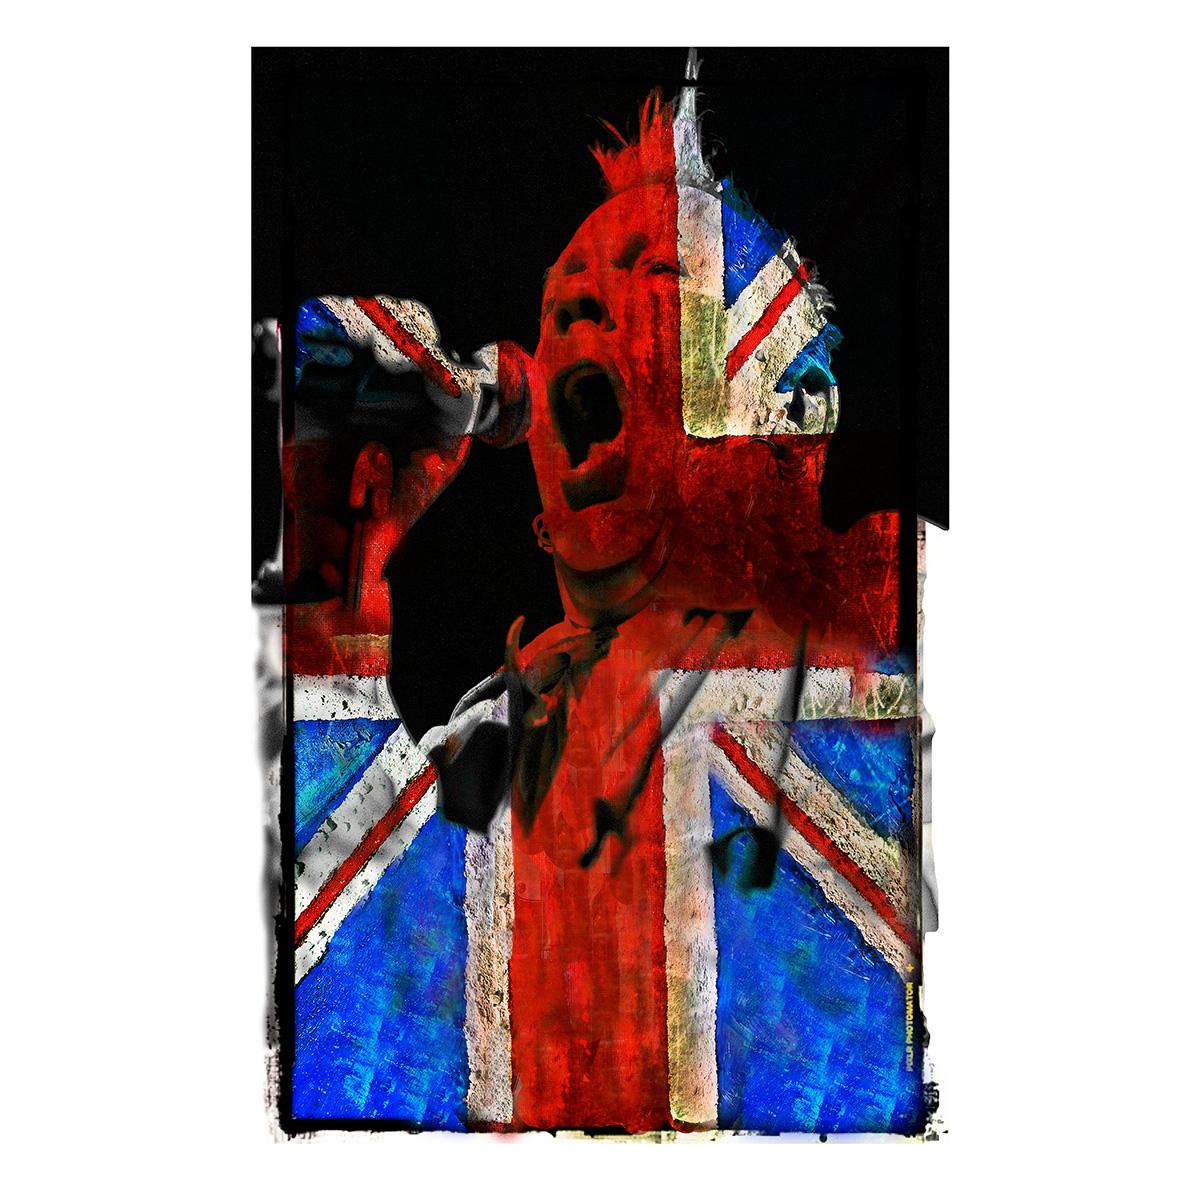 "John Lydon PIL ""English Punk"" 12""x12"" £95.99  20""x20"" £150.00  30""x30"" £300.00"